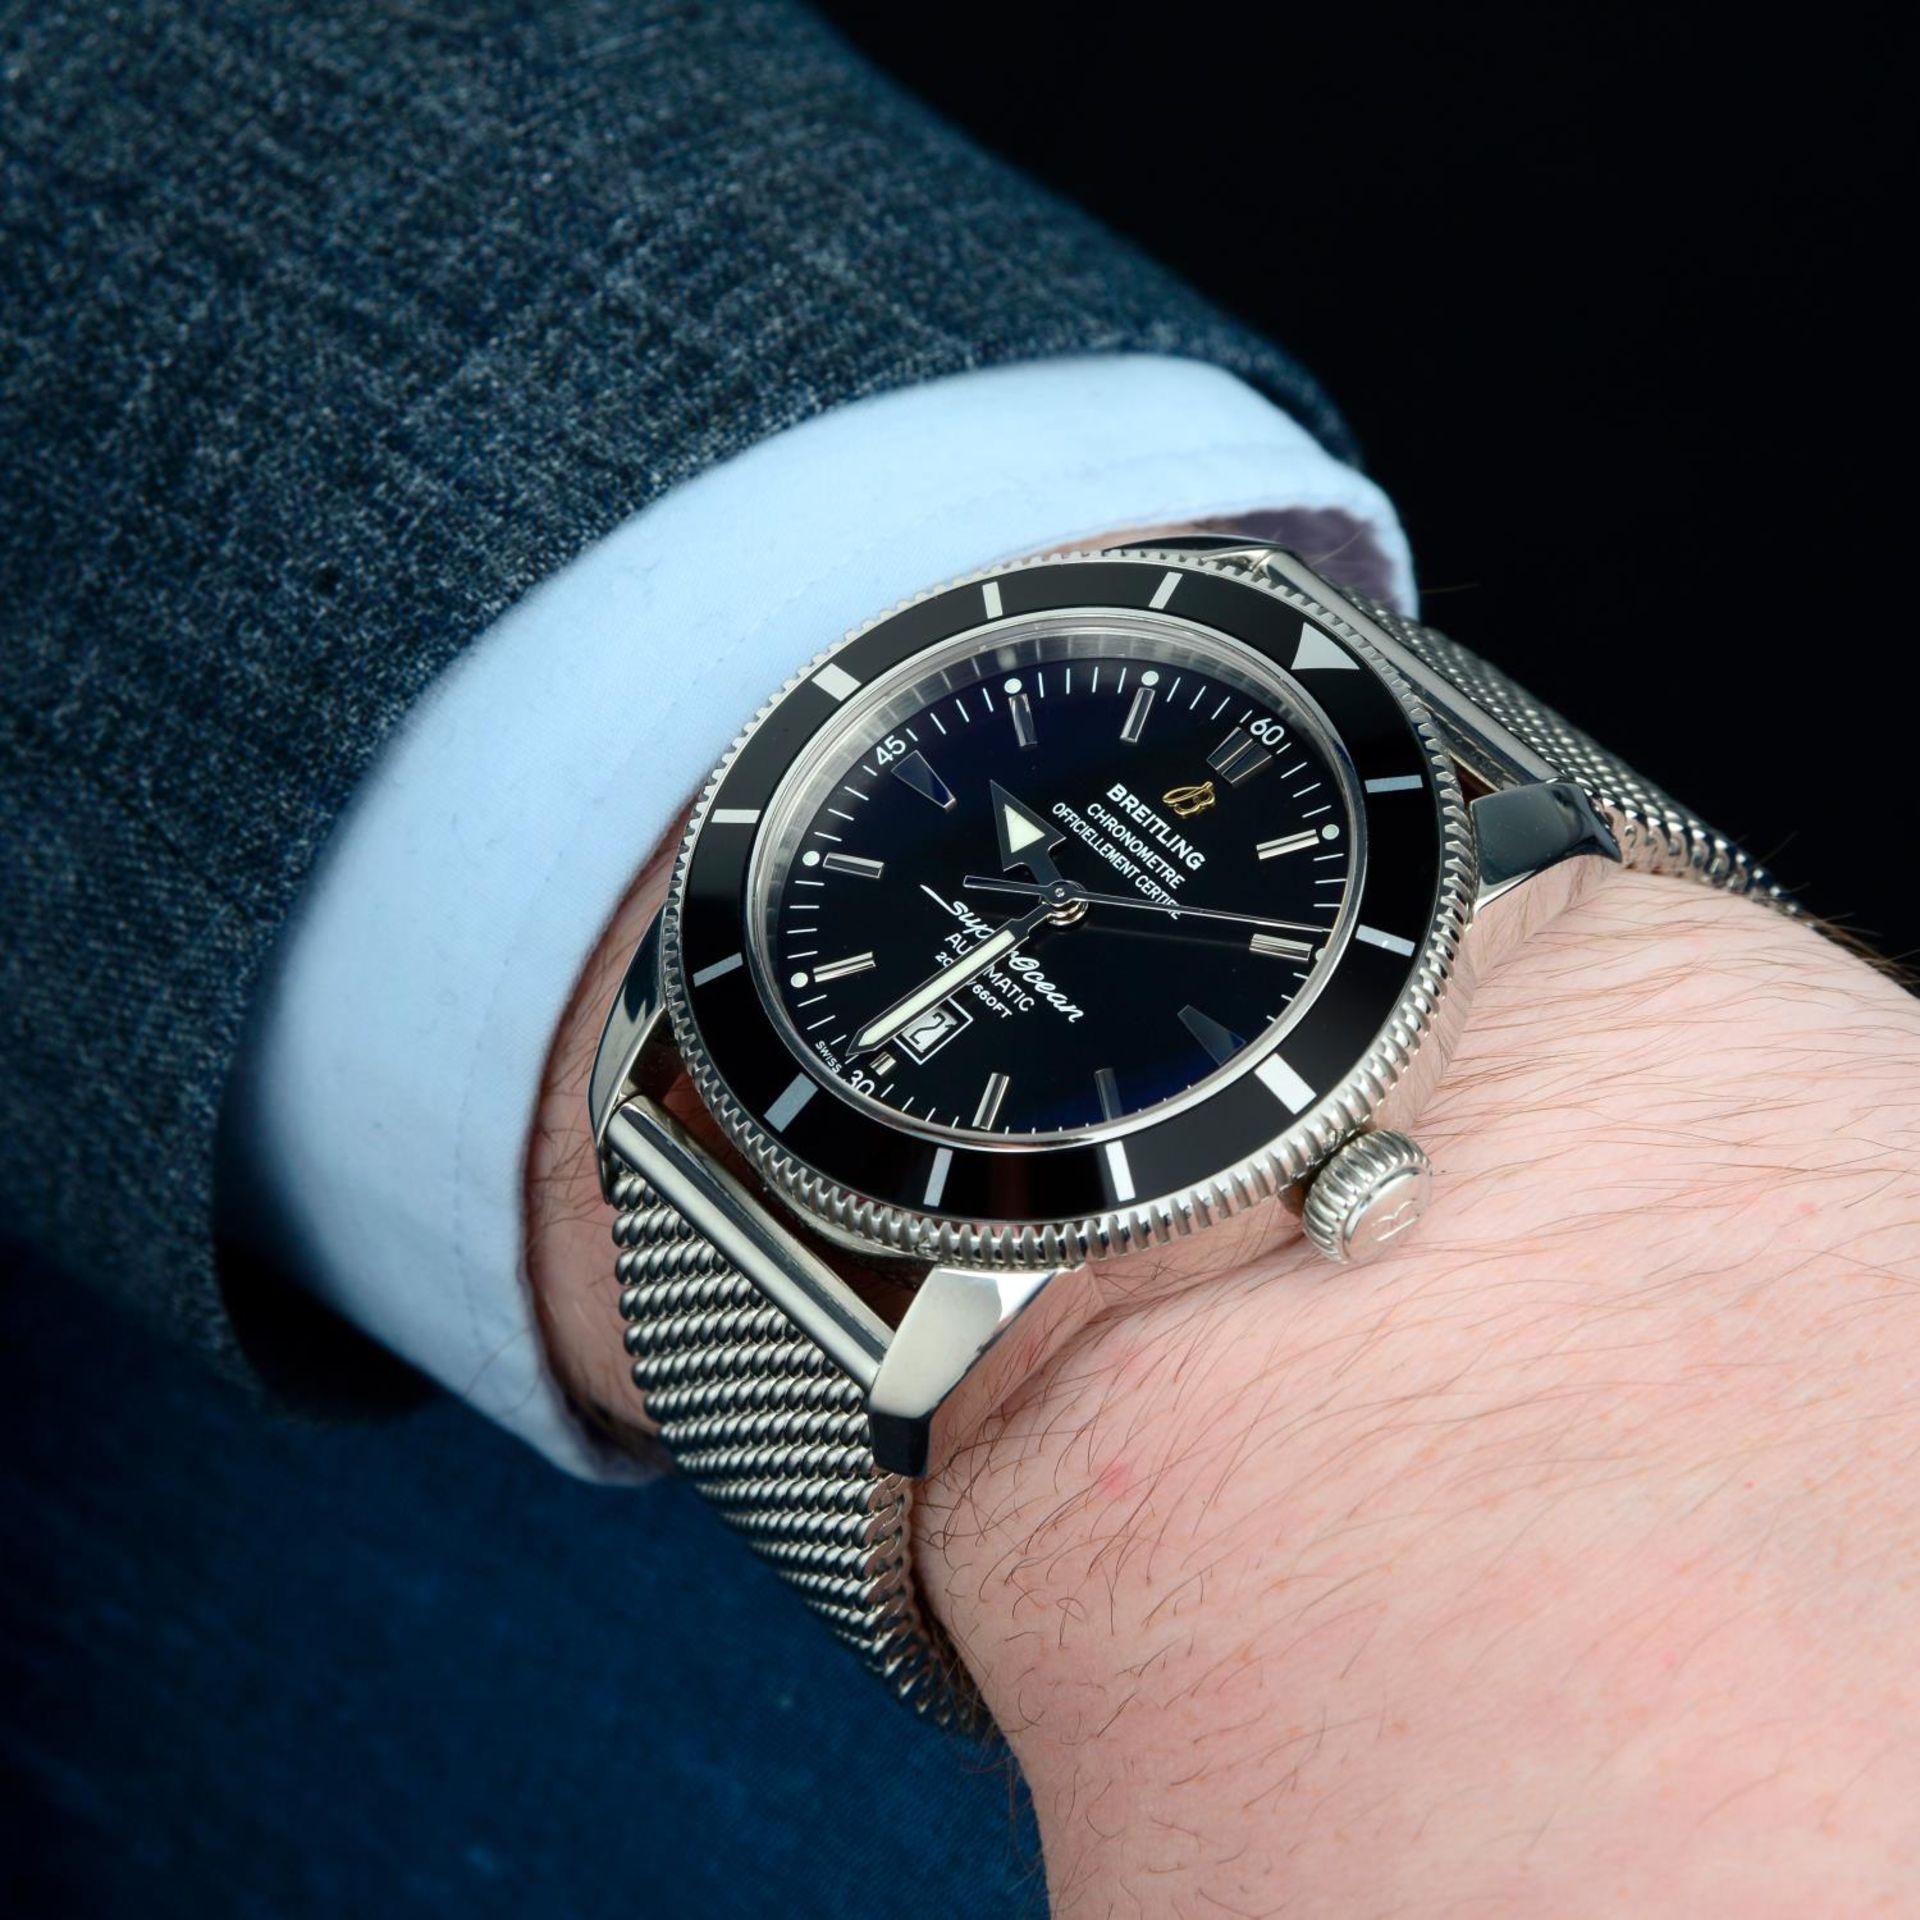 BREITLING - a SuperOcean Heritage 46 bracelet watch. - Bild 3 aus 6